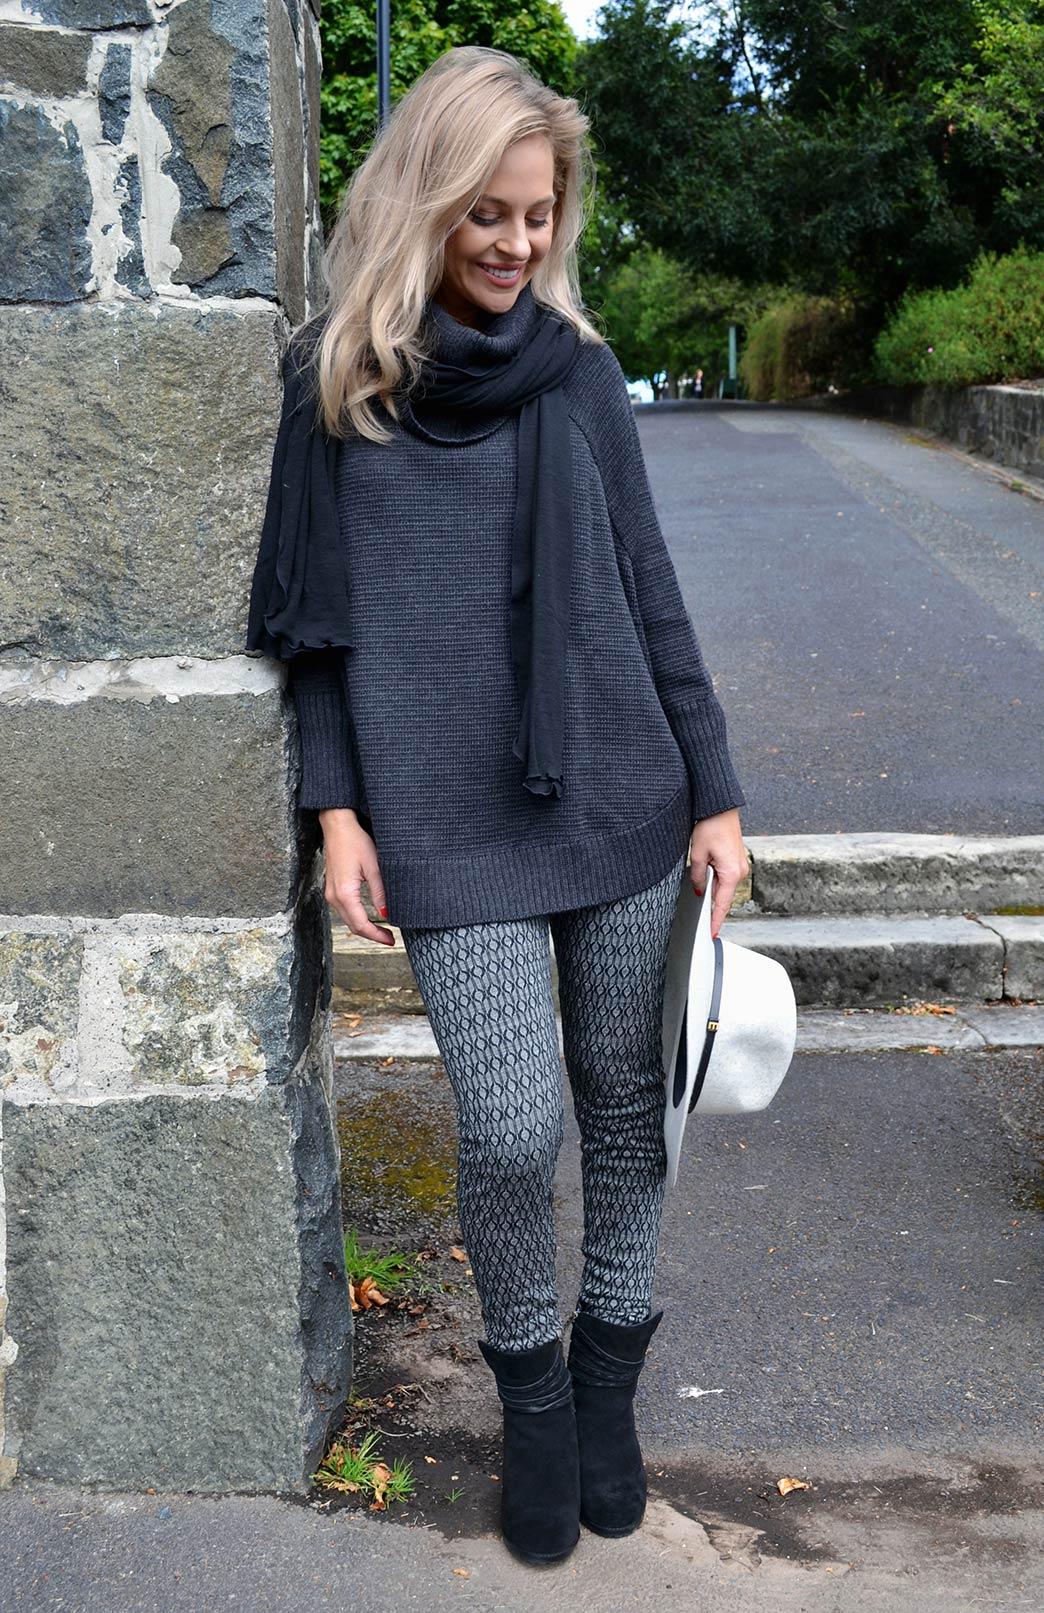 Chunky Merino Wool Cowl Neck Poncho With Sleeves - Women's Charcoal Grey Wool Poncho with sleeves and cowl neck line - Smitten Merino Tasmania Australia